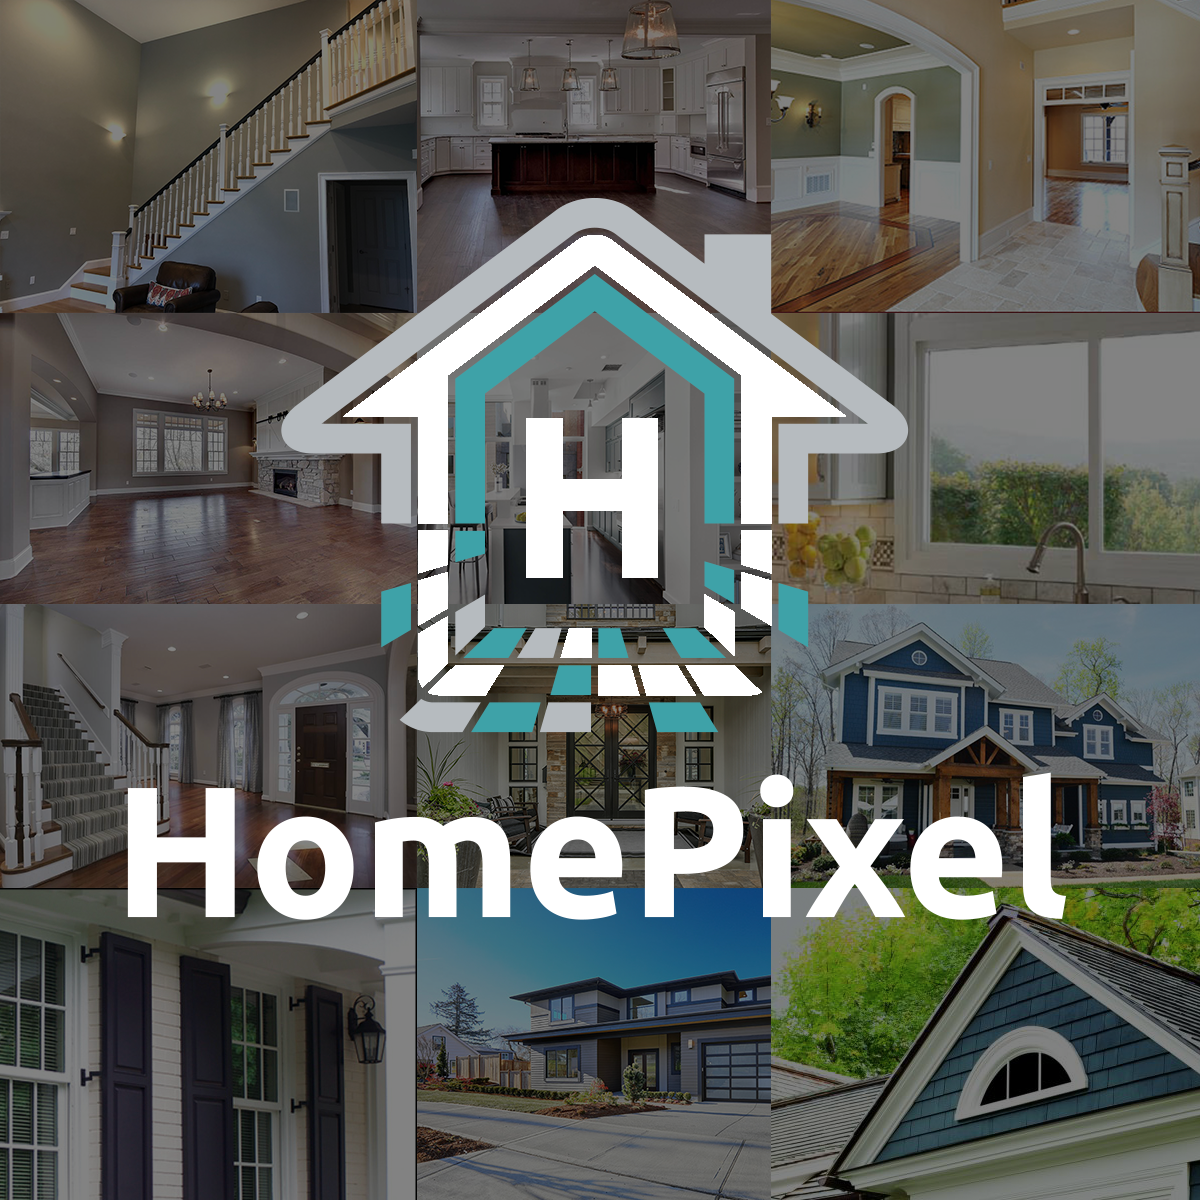 Home Pixel of Austin